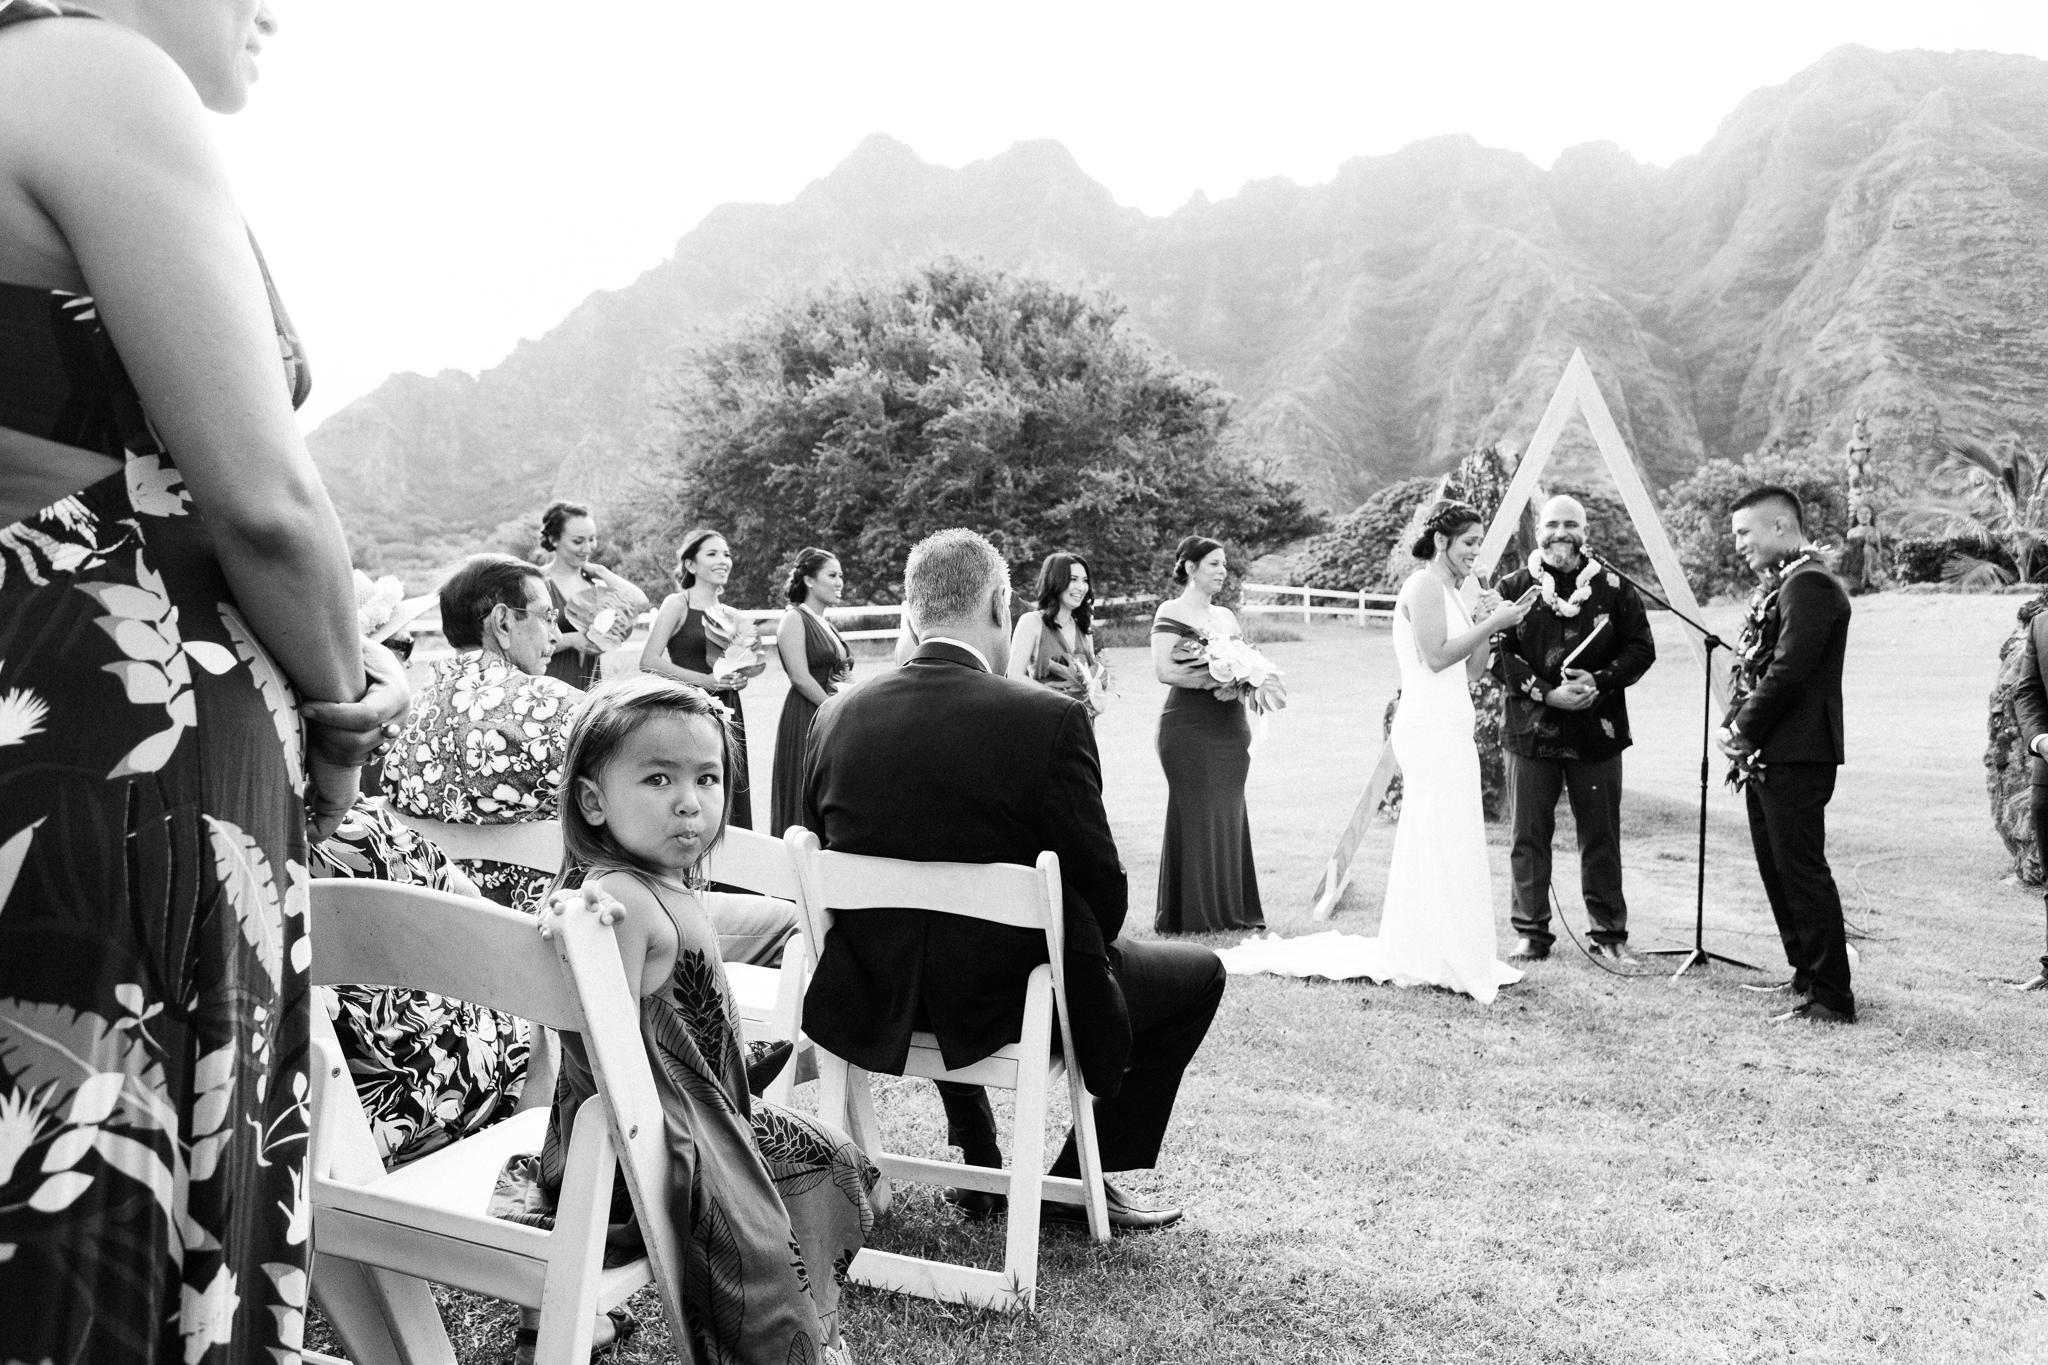 Kualoa_Ranch_Wedding_Photographer_Tone_Hawaii-23.jpg